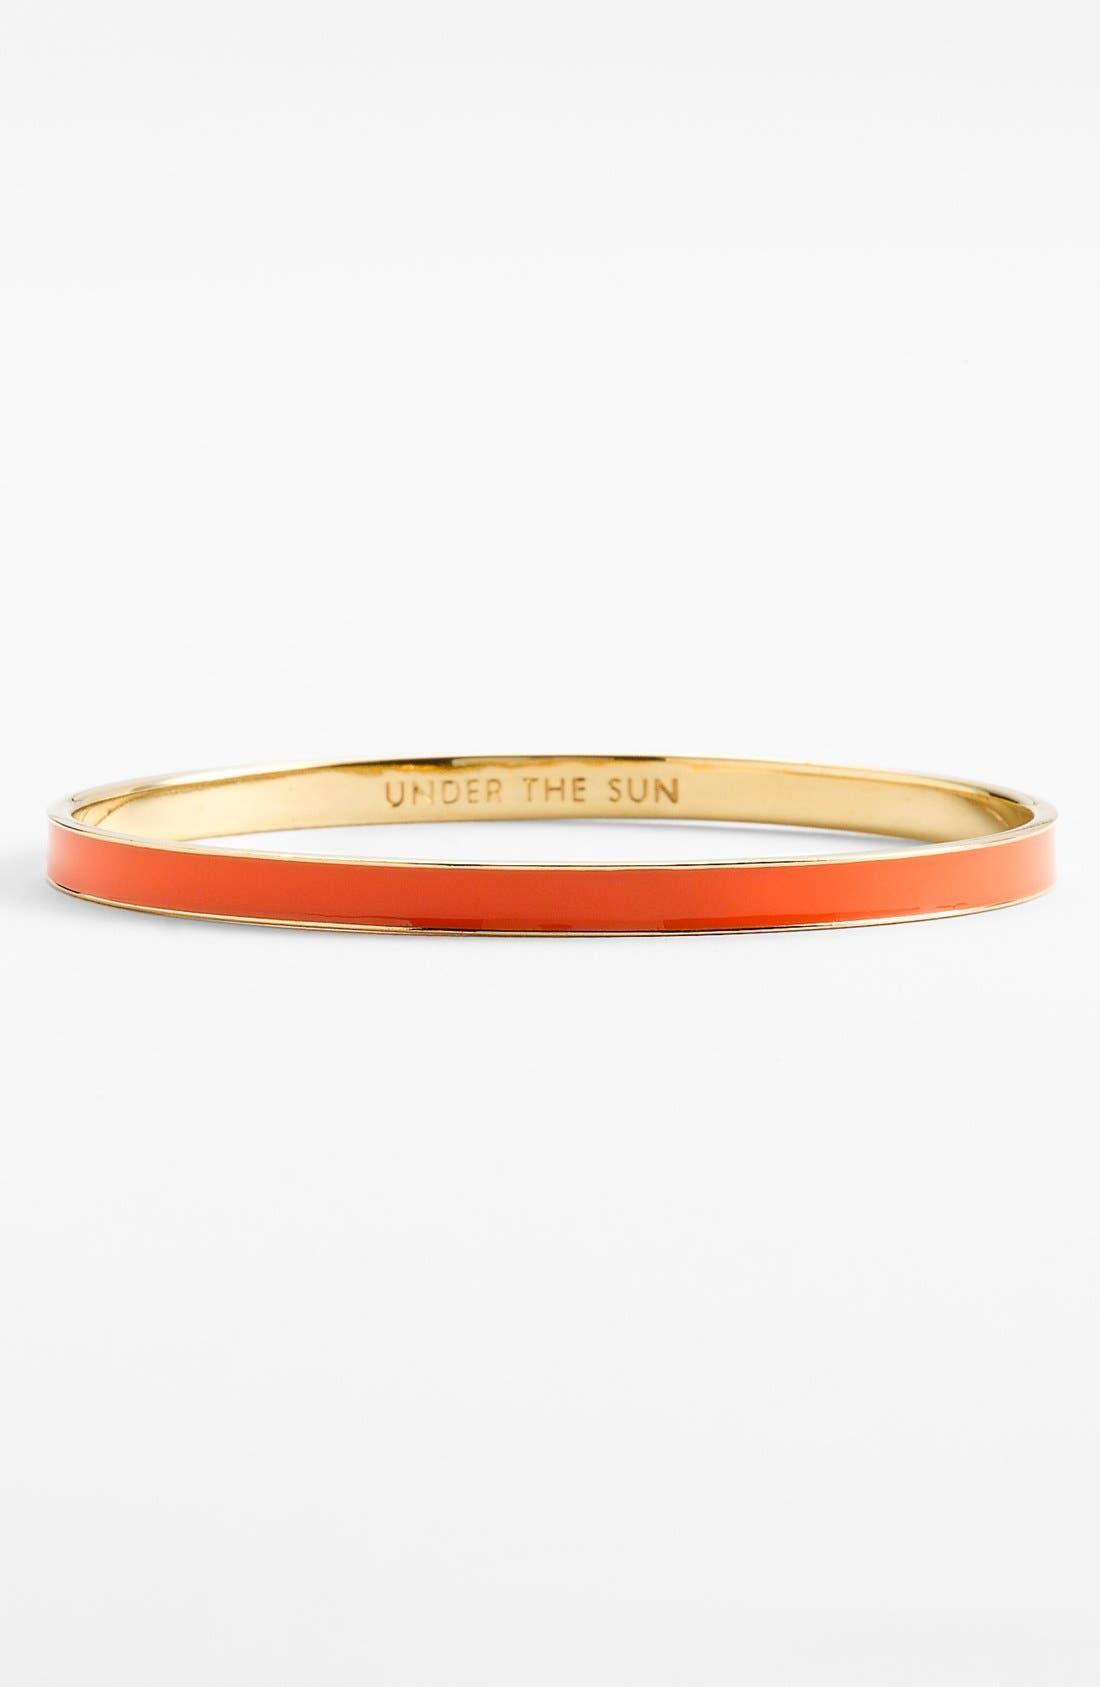 Main Image - kate spade new york 'idiom - under the sun' ultra thin enamel bangle